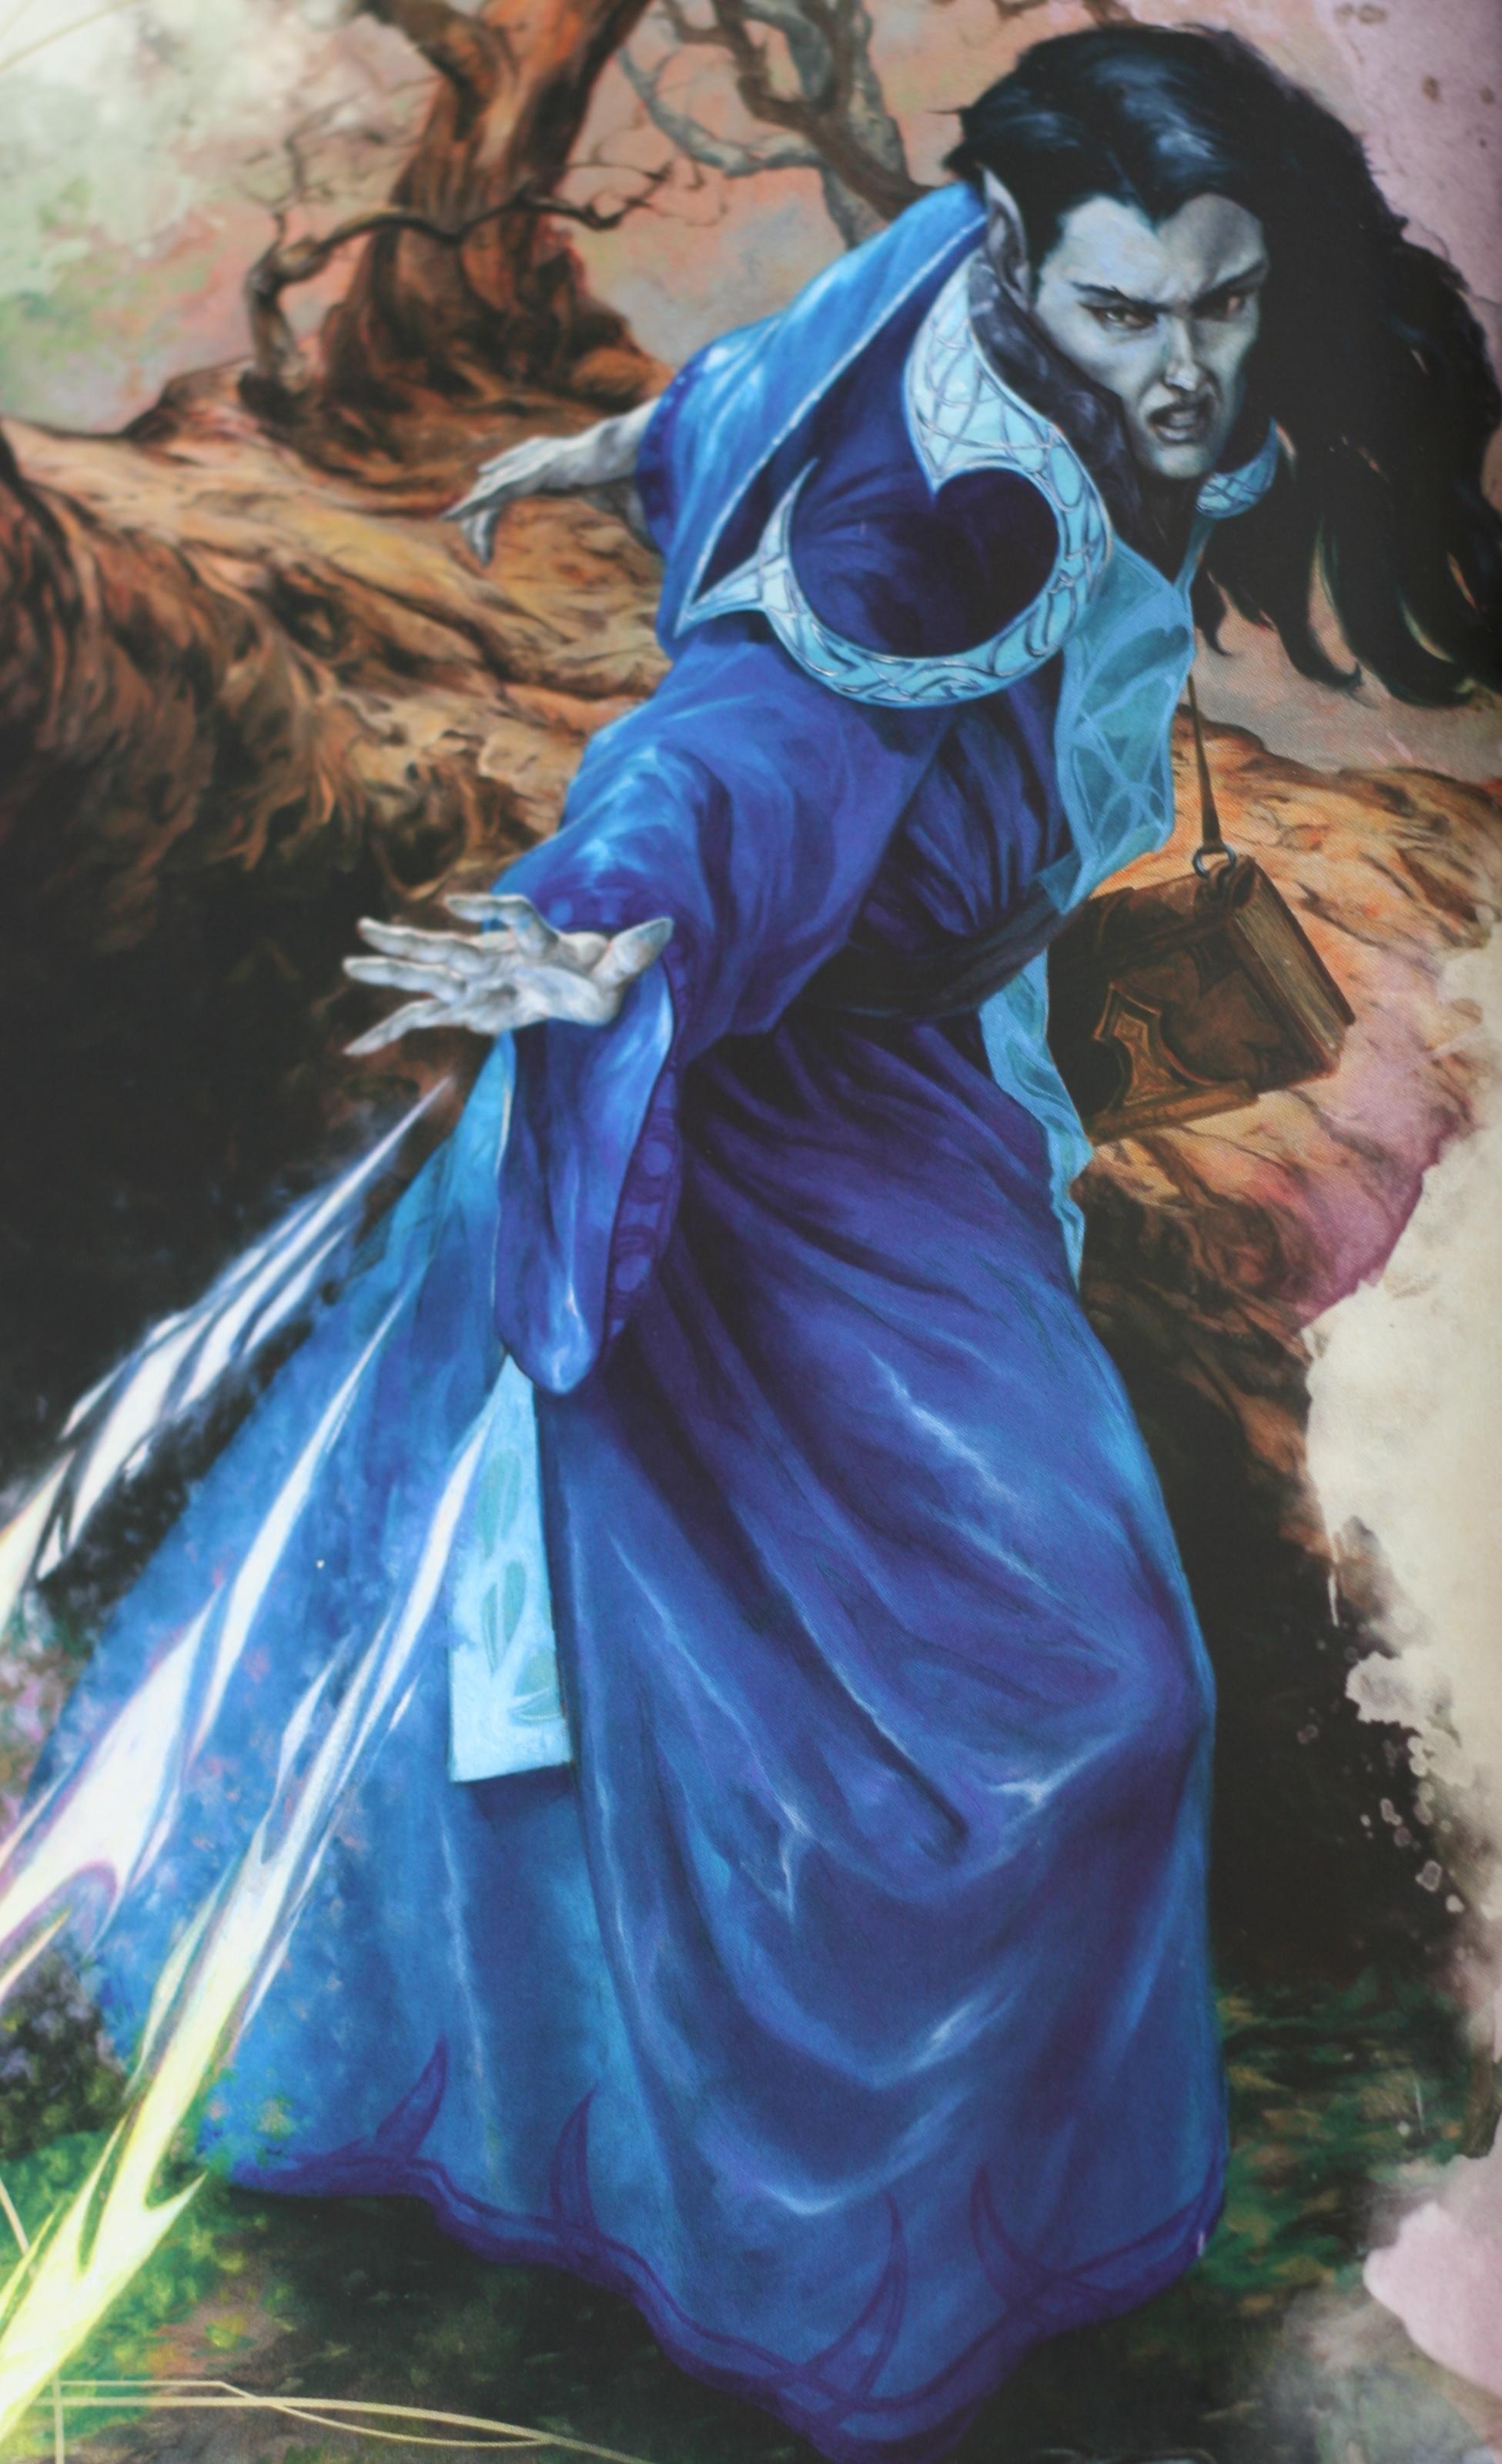 image 157 blue mage jpg warriors of myth wiki fandom powered